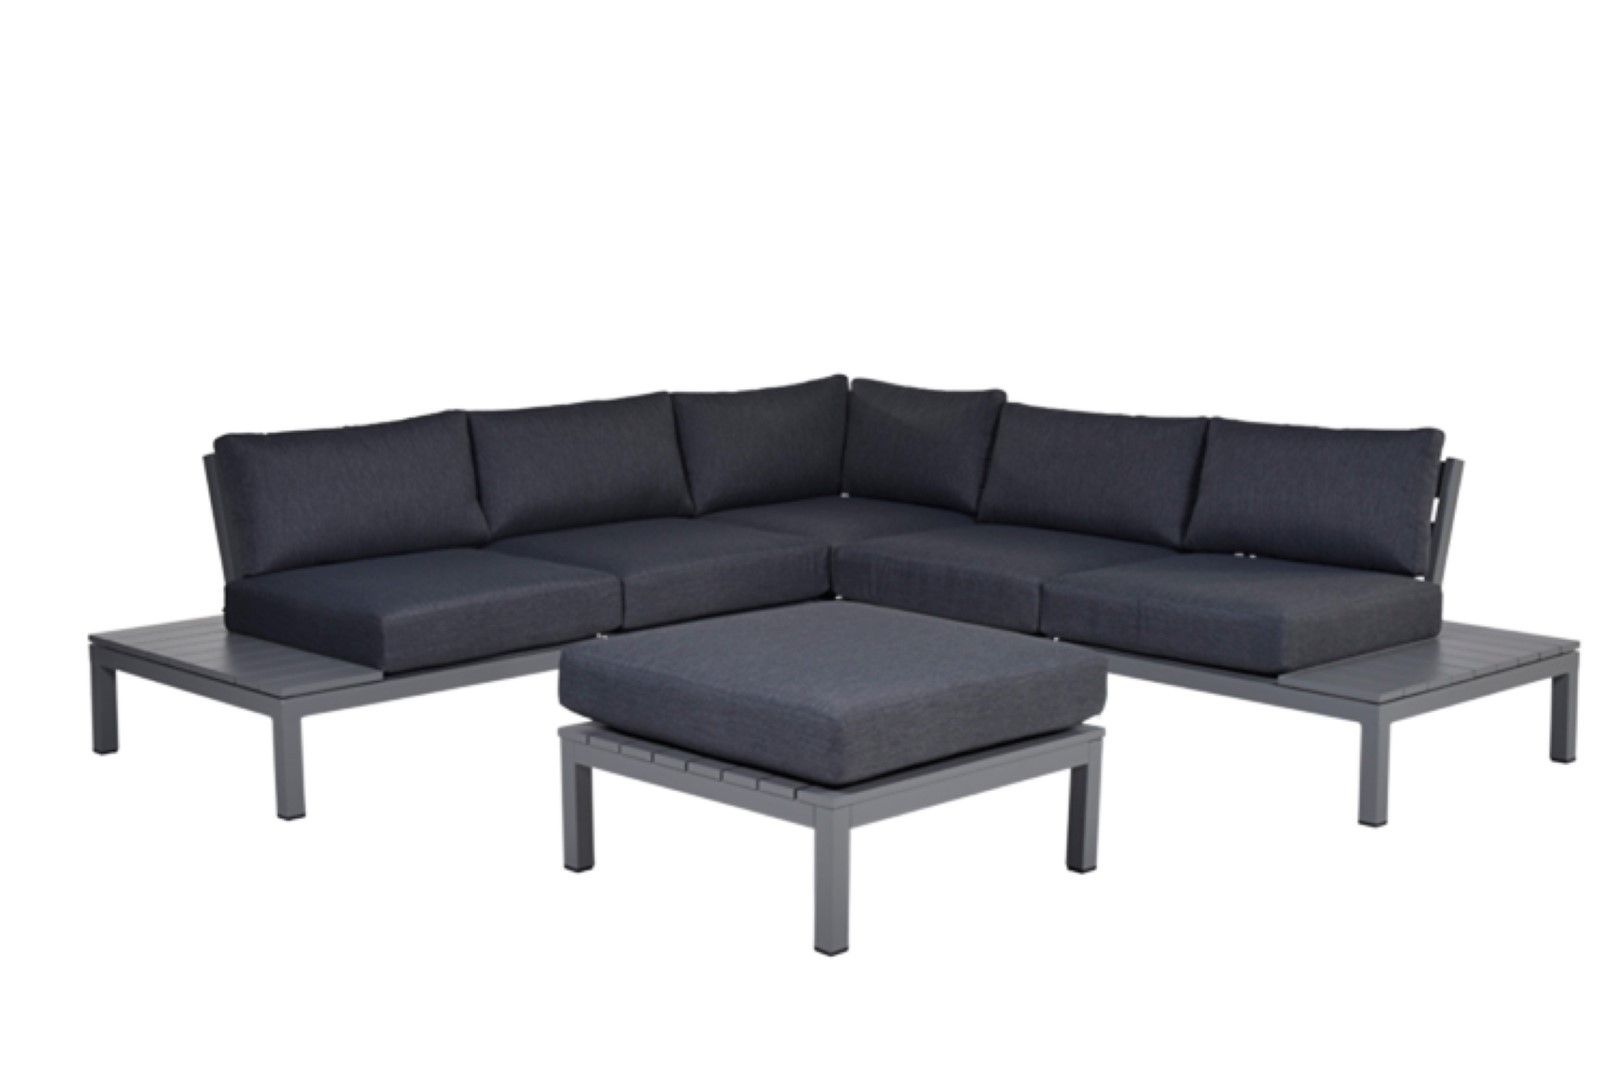 Annabella loungeset 4-delig arctic grey reflex black